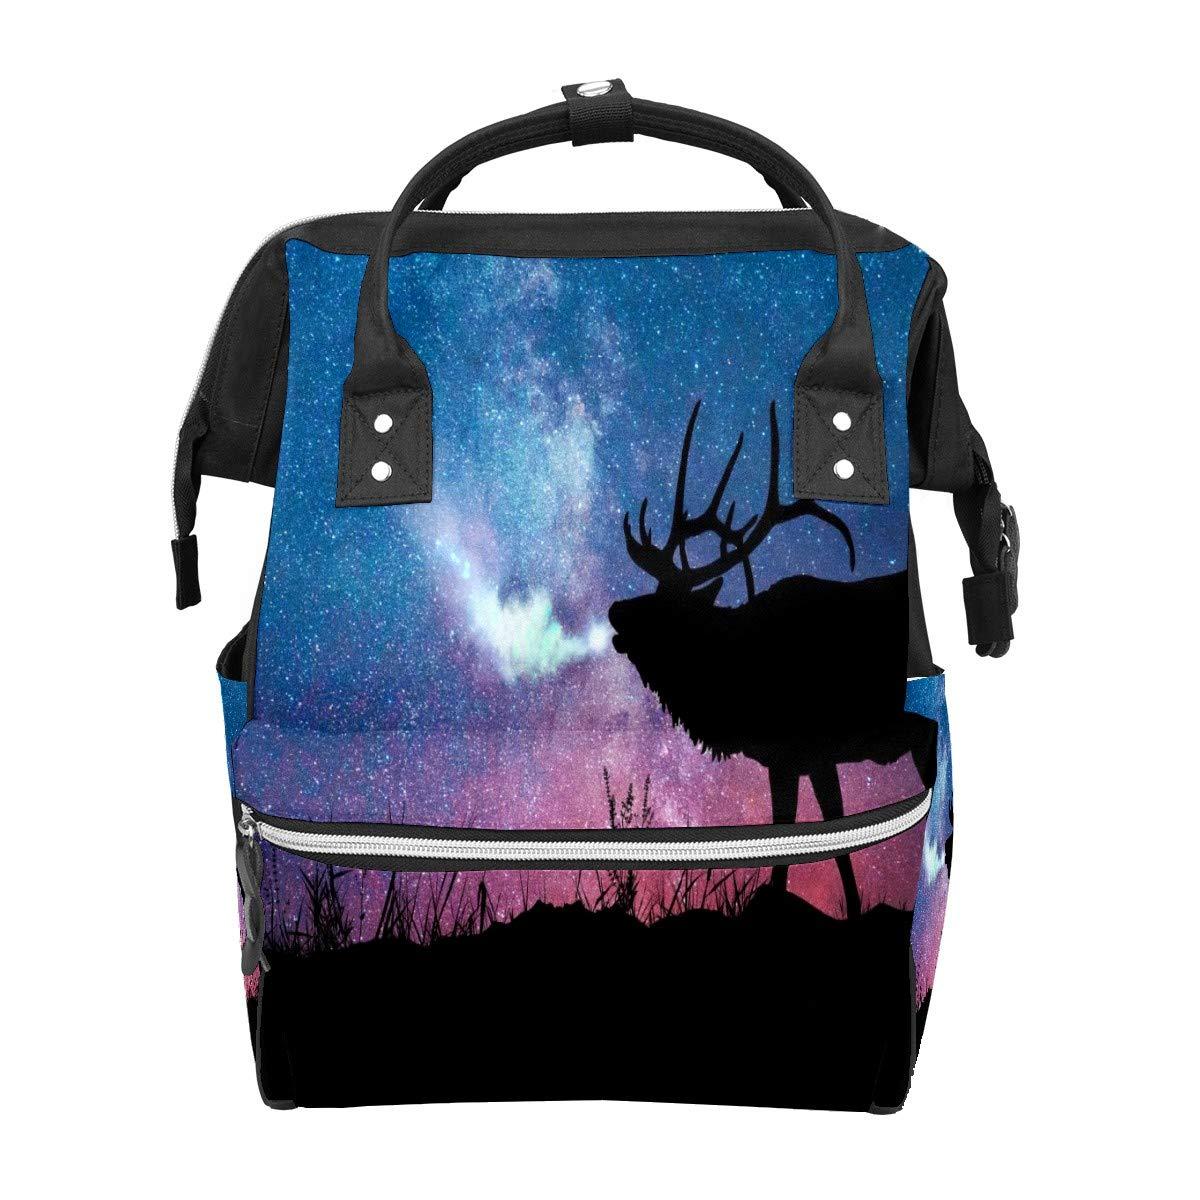 Diaper Bag Backpack Art Visual Deer Creativity Multifunction Travel Back Pack Baby Changing Bags Large Capacity Waterproof Stylish